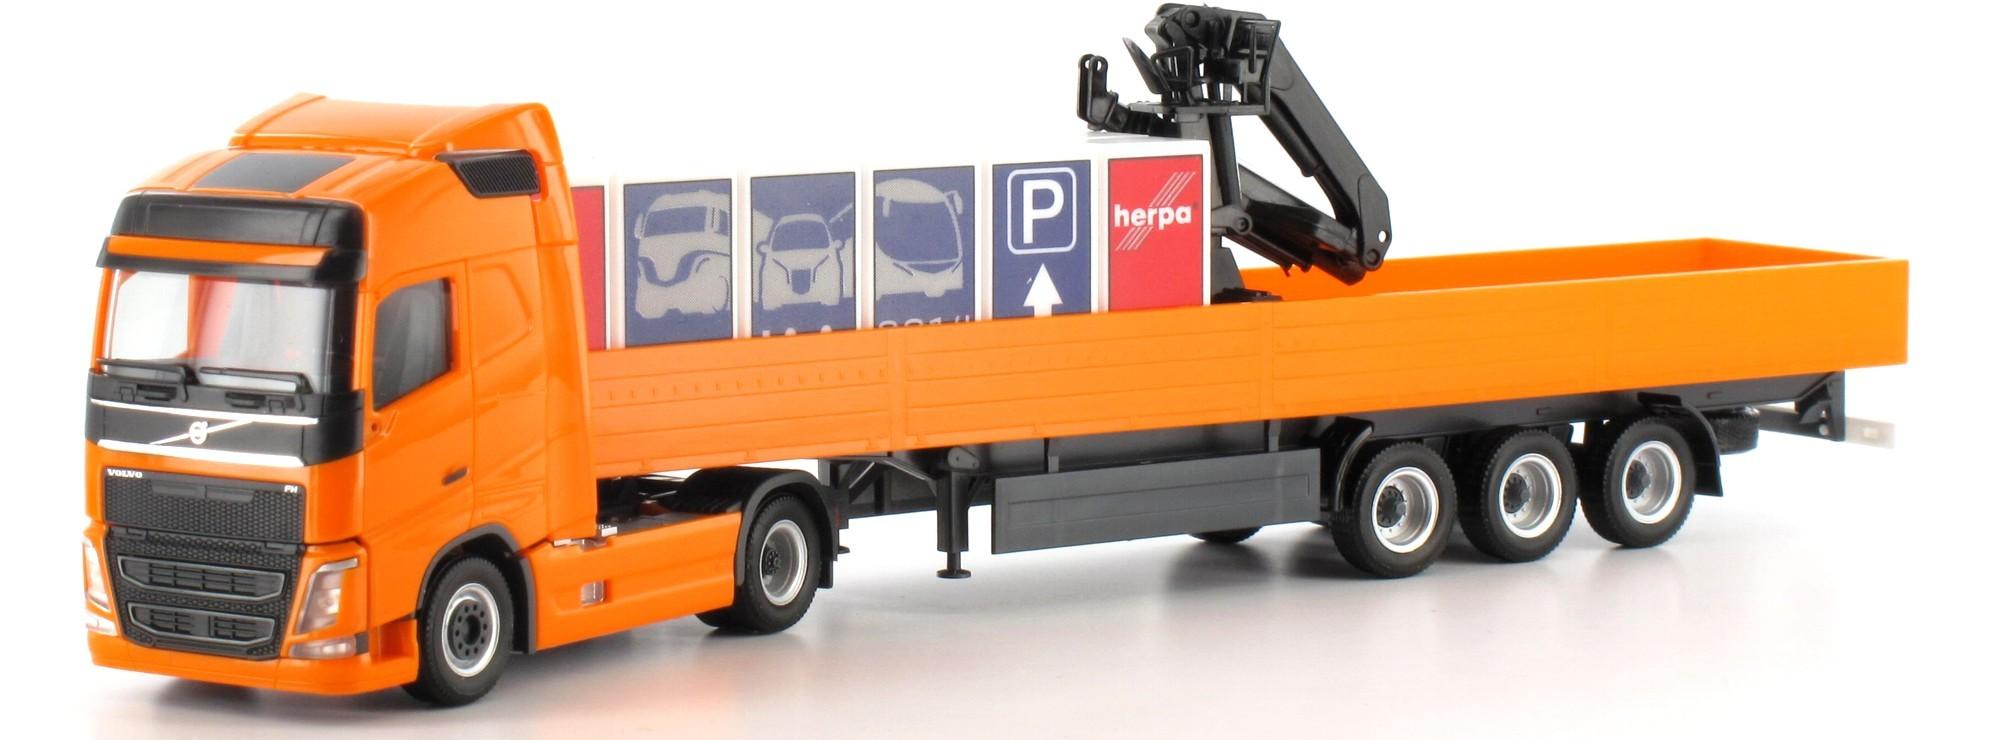 Herpa Volvo FH Gl. Pritschen-Sattelzug IAA-Messemodell (Restmenge)